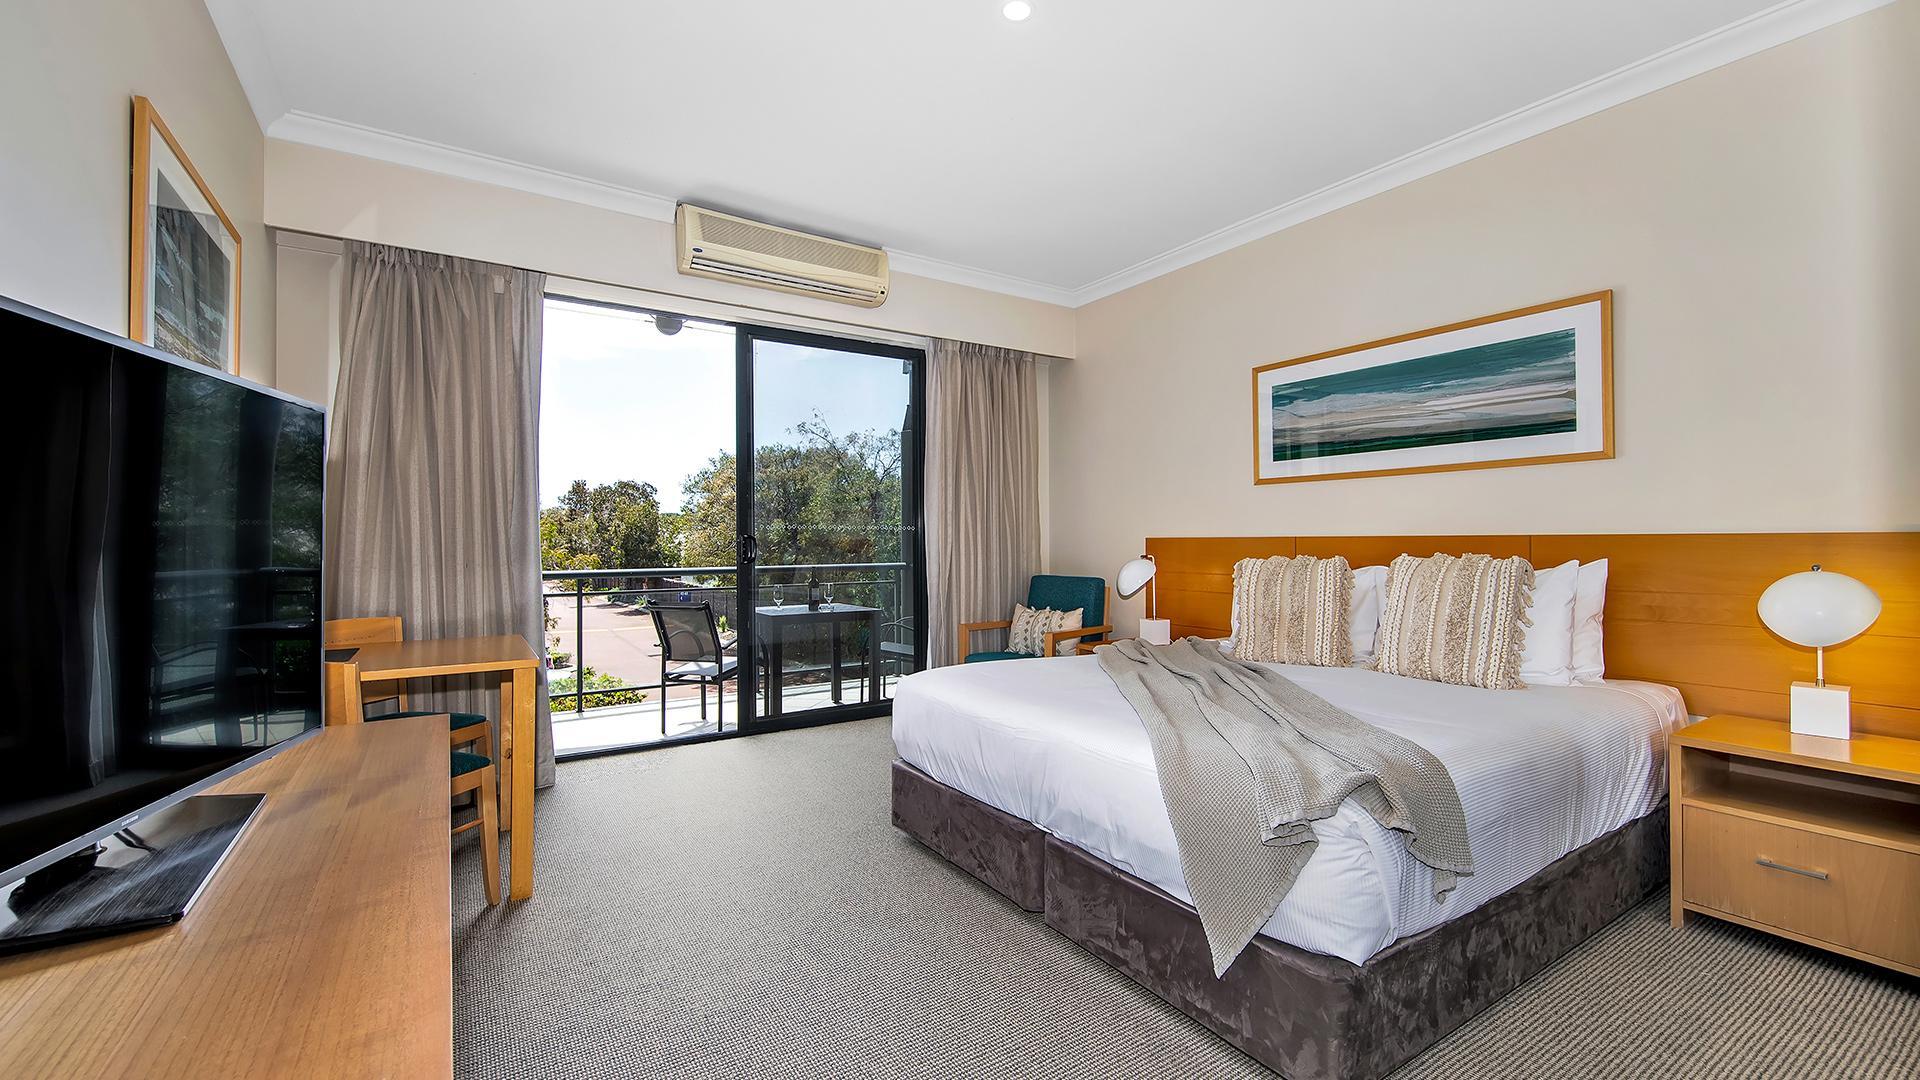 Studio Apartment  image 1 at The Sebel Busselton by City of Busselton, Western Australia, Australia